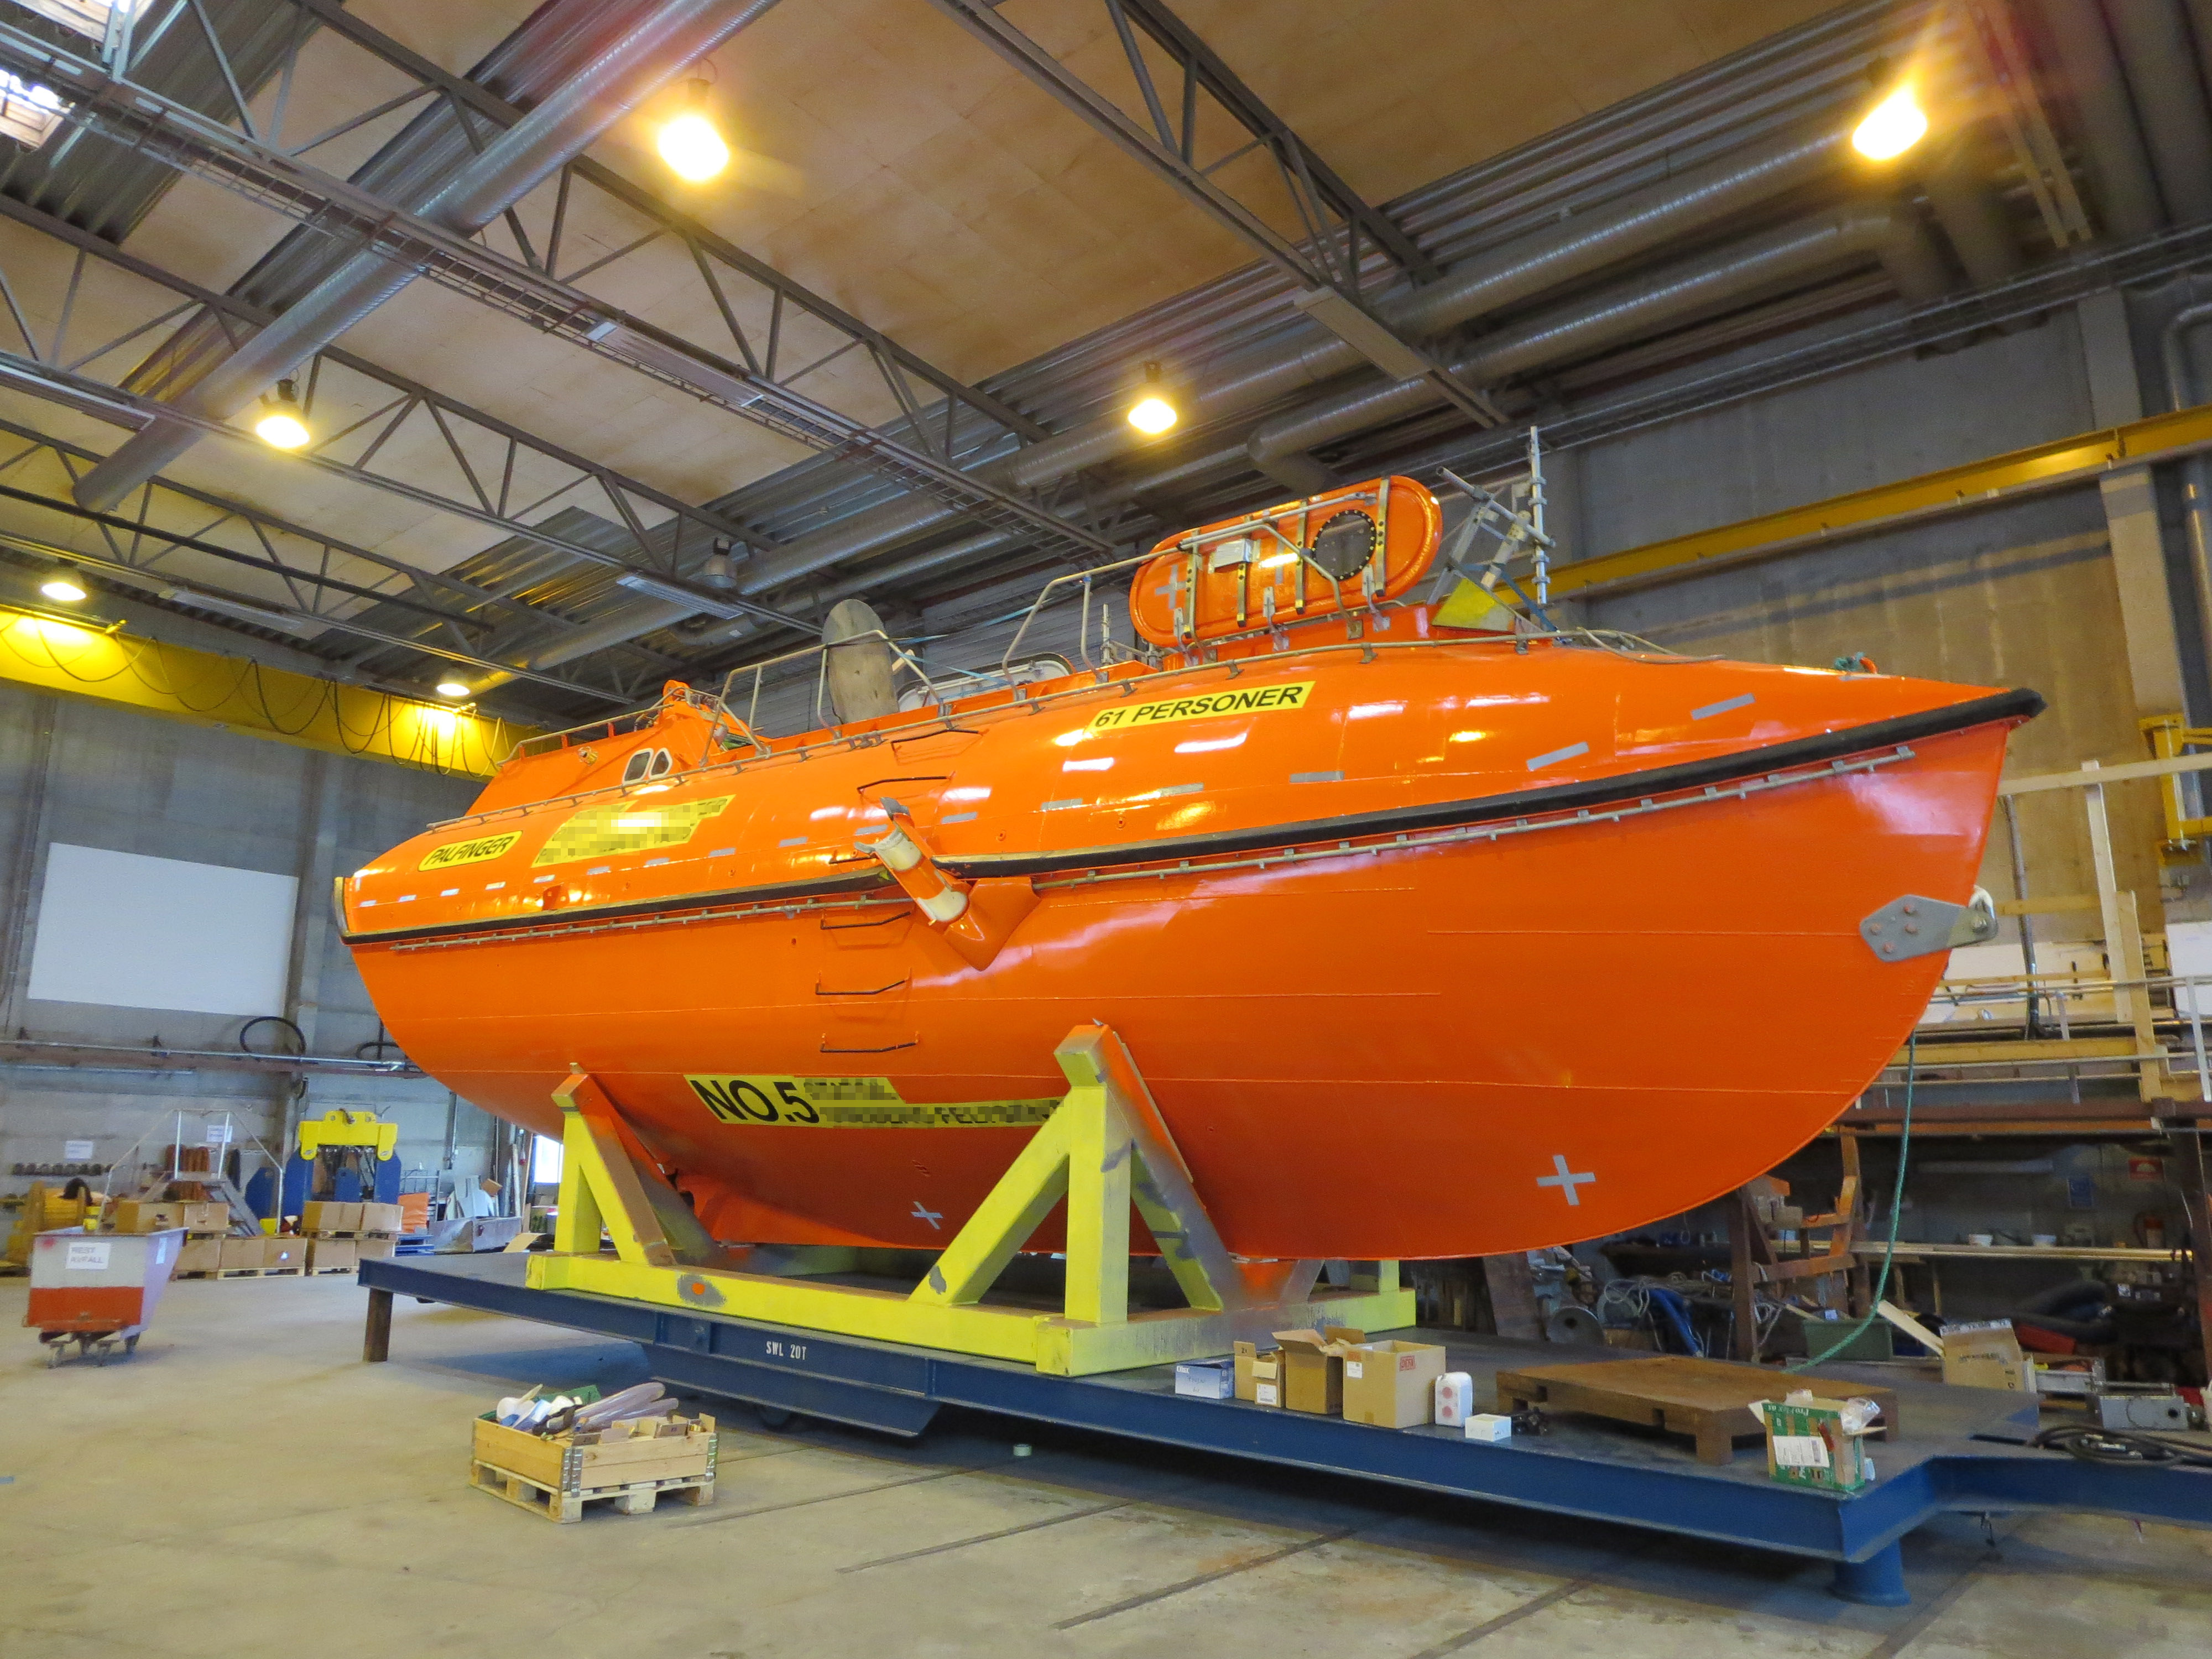 Lifeboat refurbishment